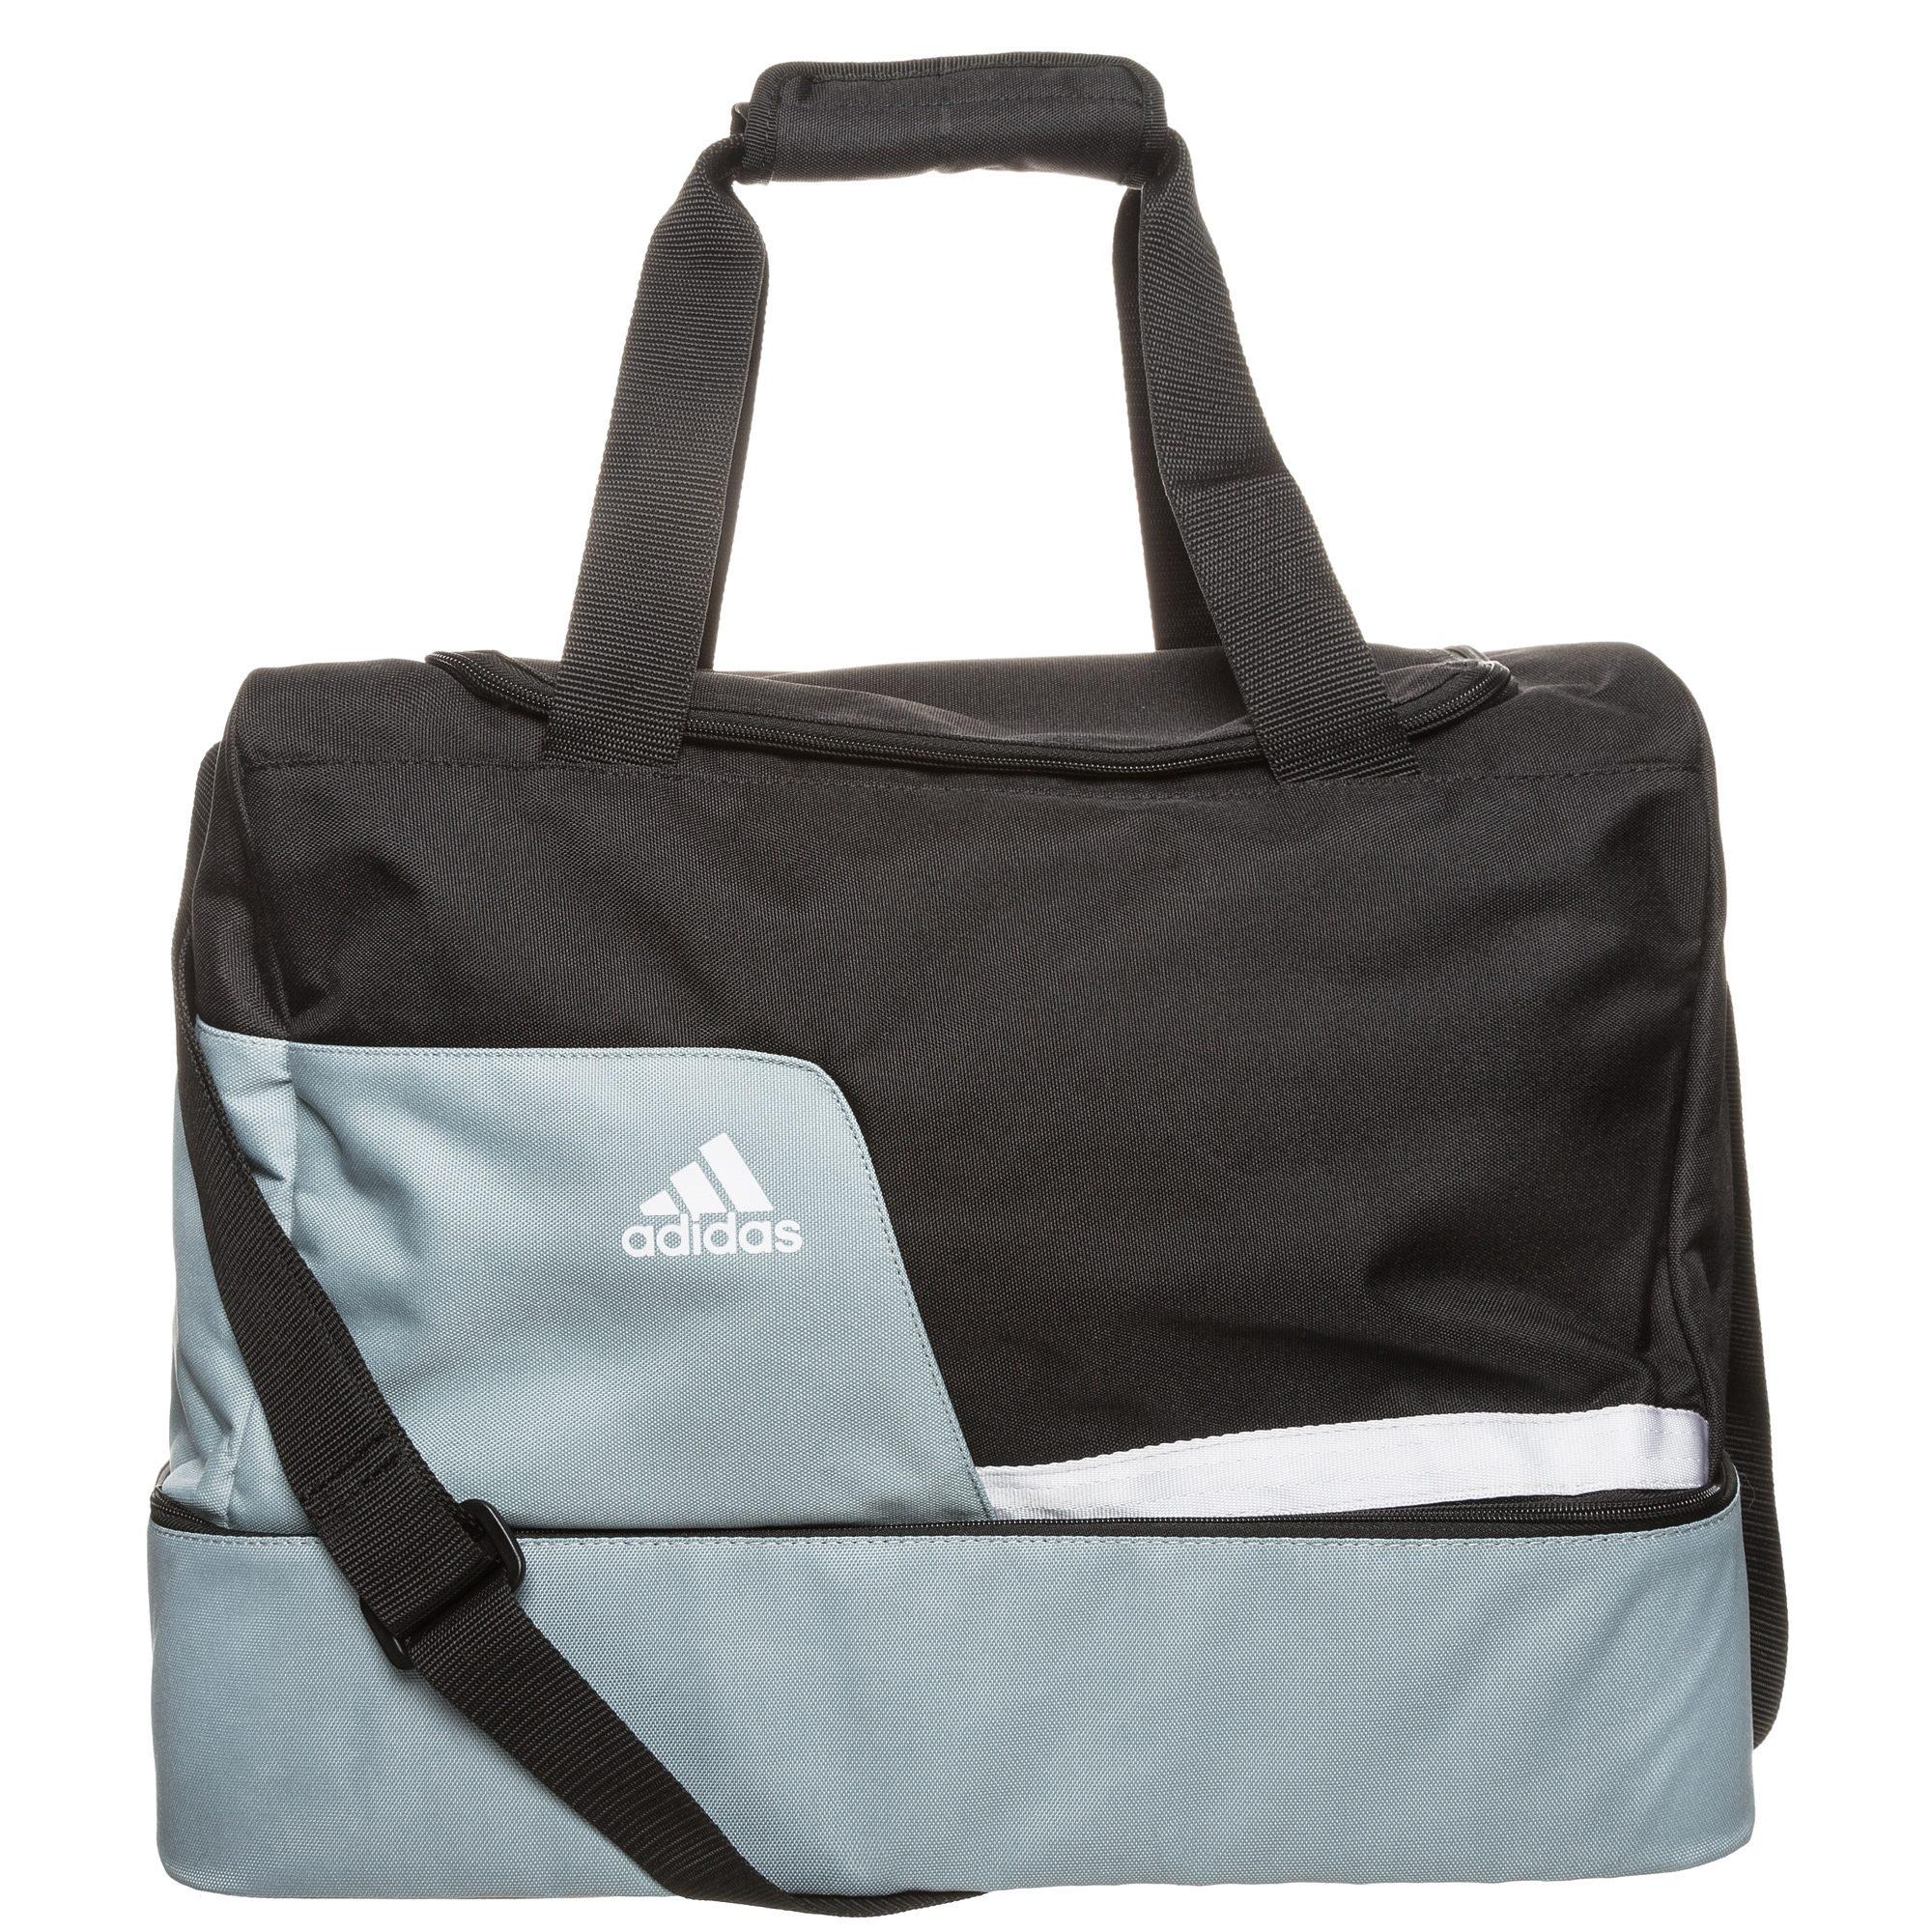 adidas Performance Tiro Team Bag Bottom Compartment S Fußballtasche